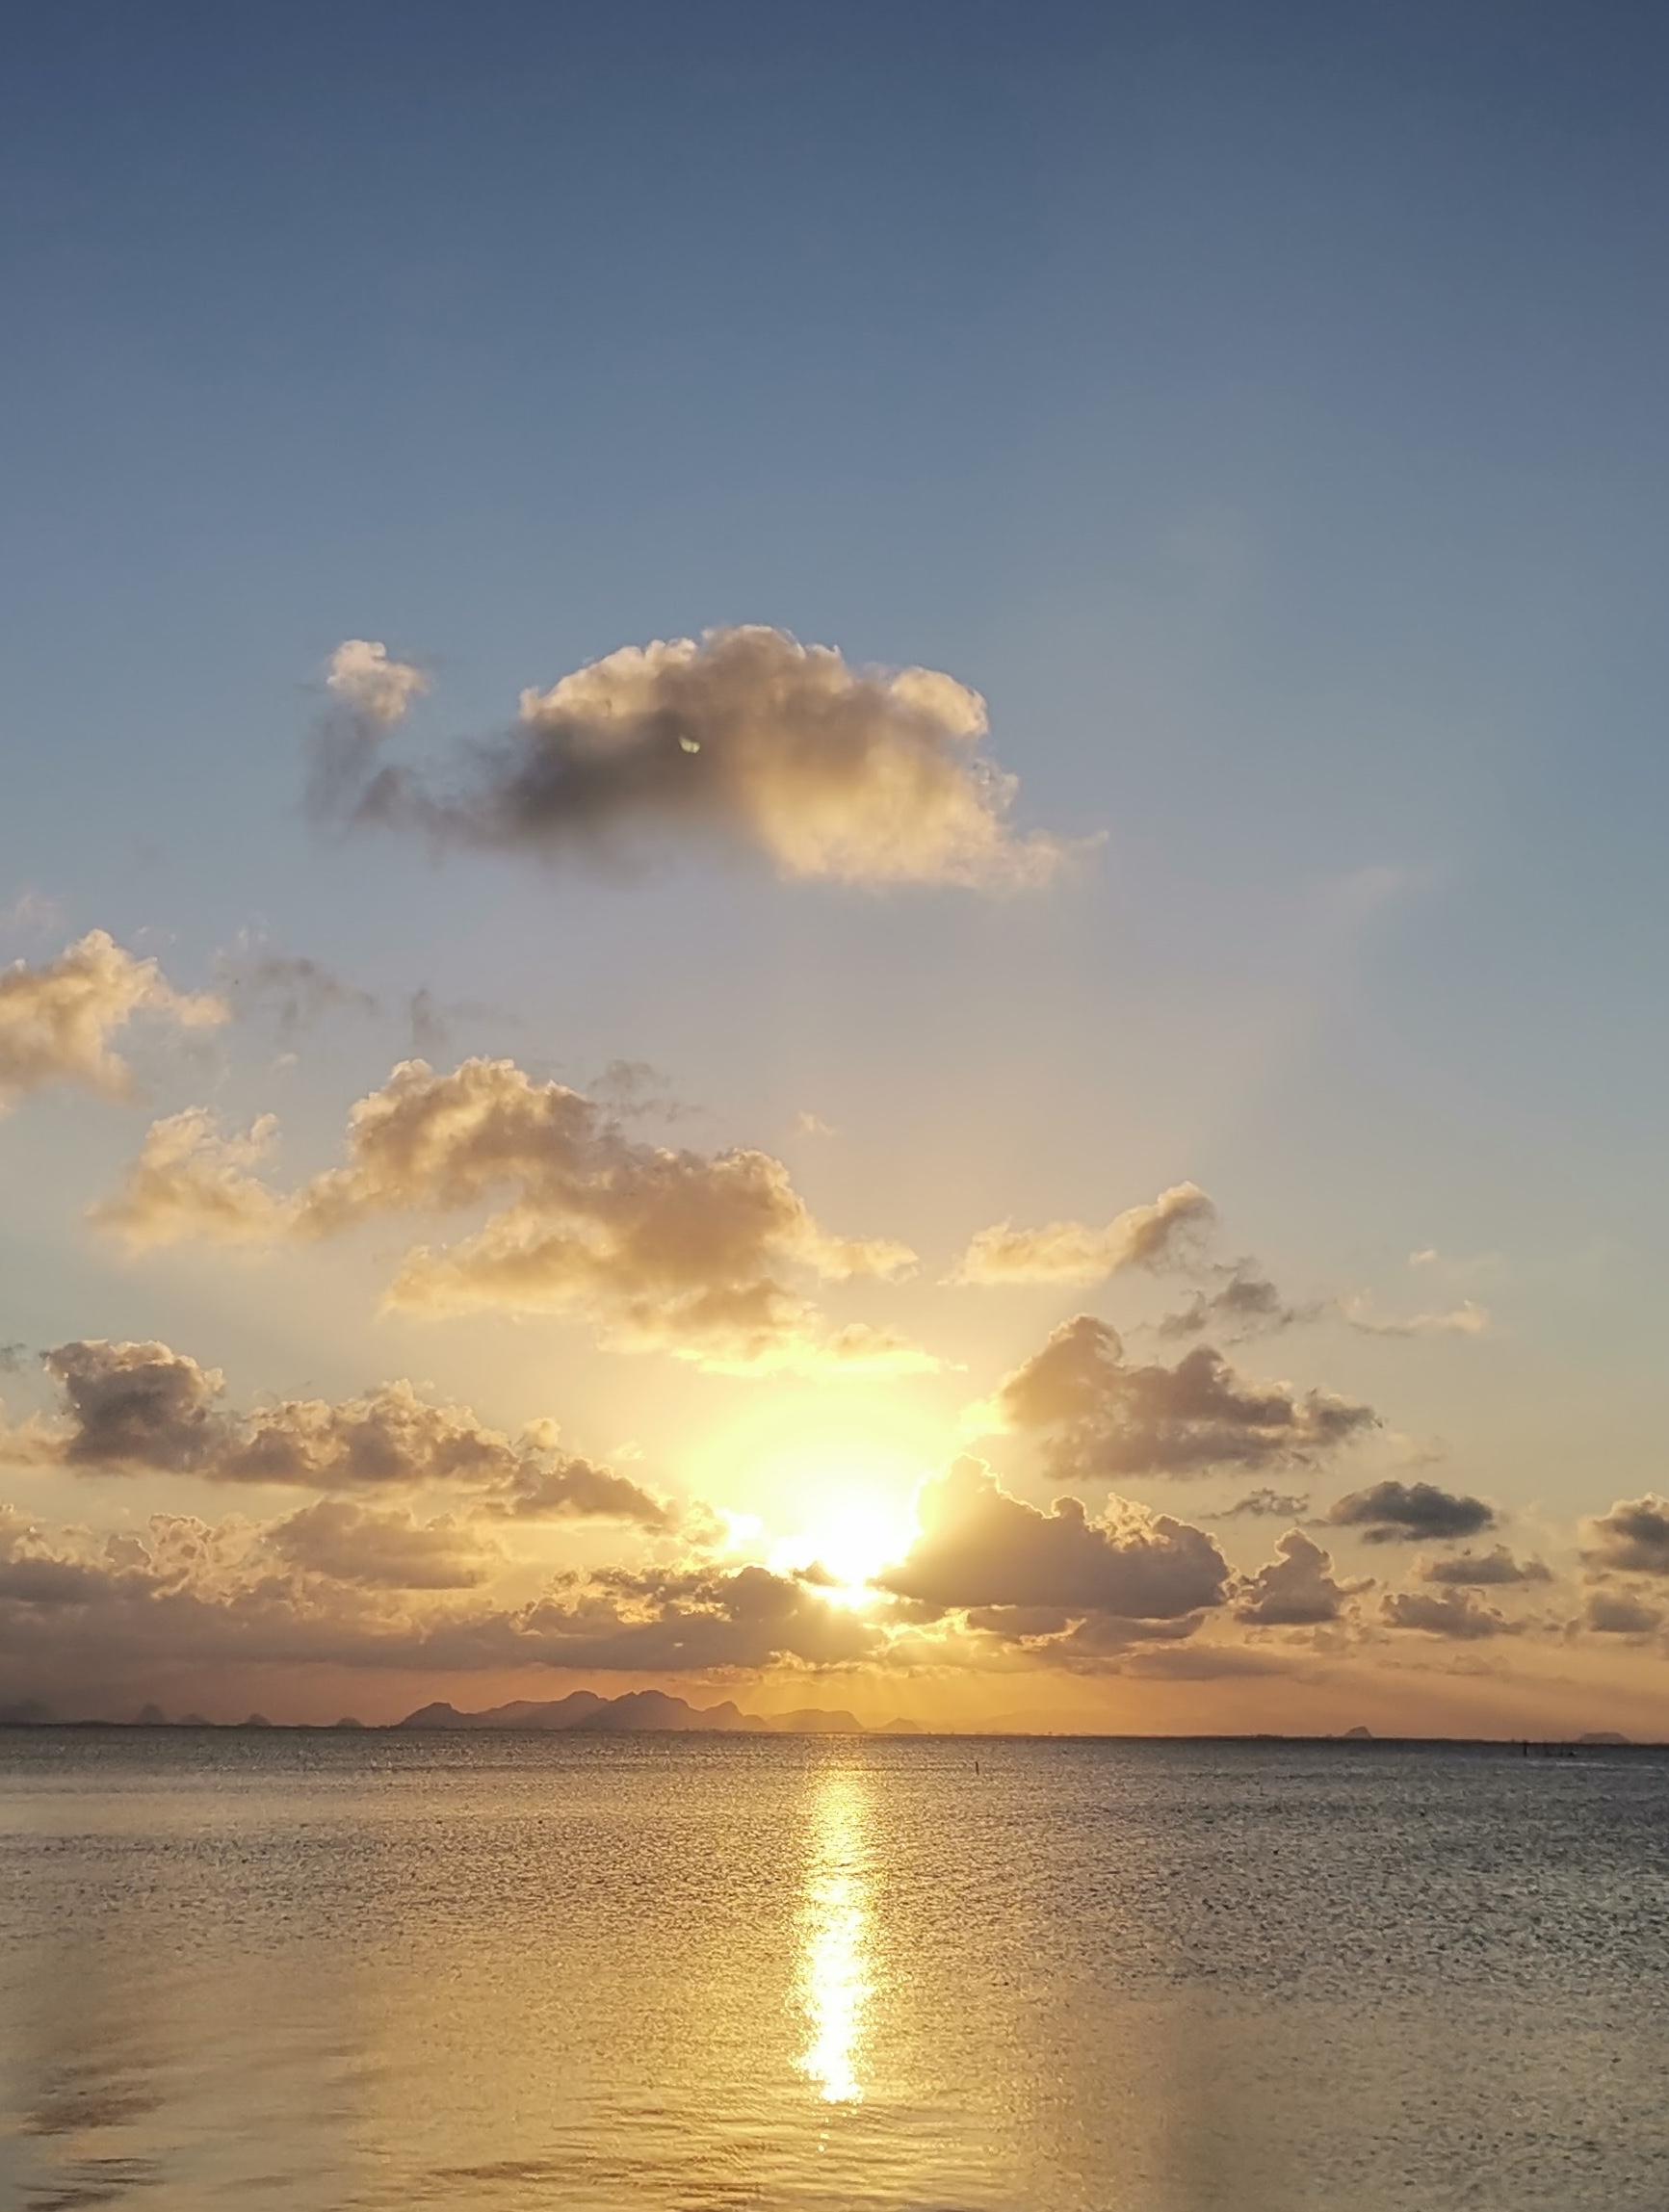 sun peeking through clouds over the ocean